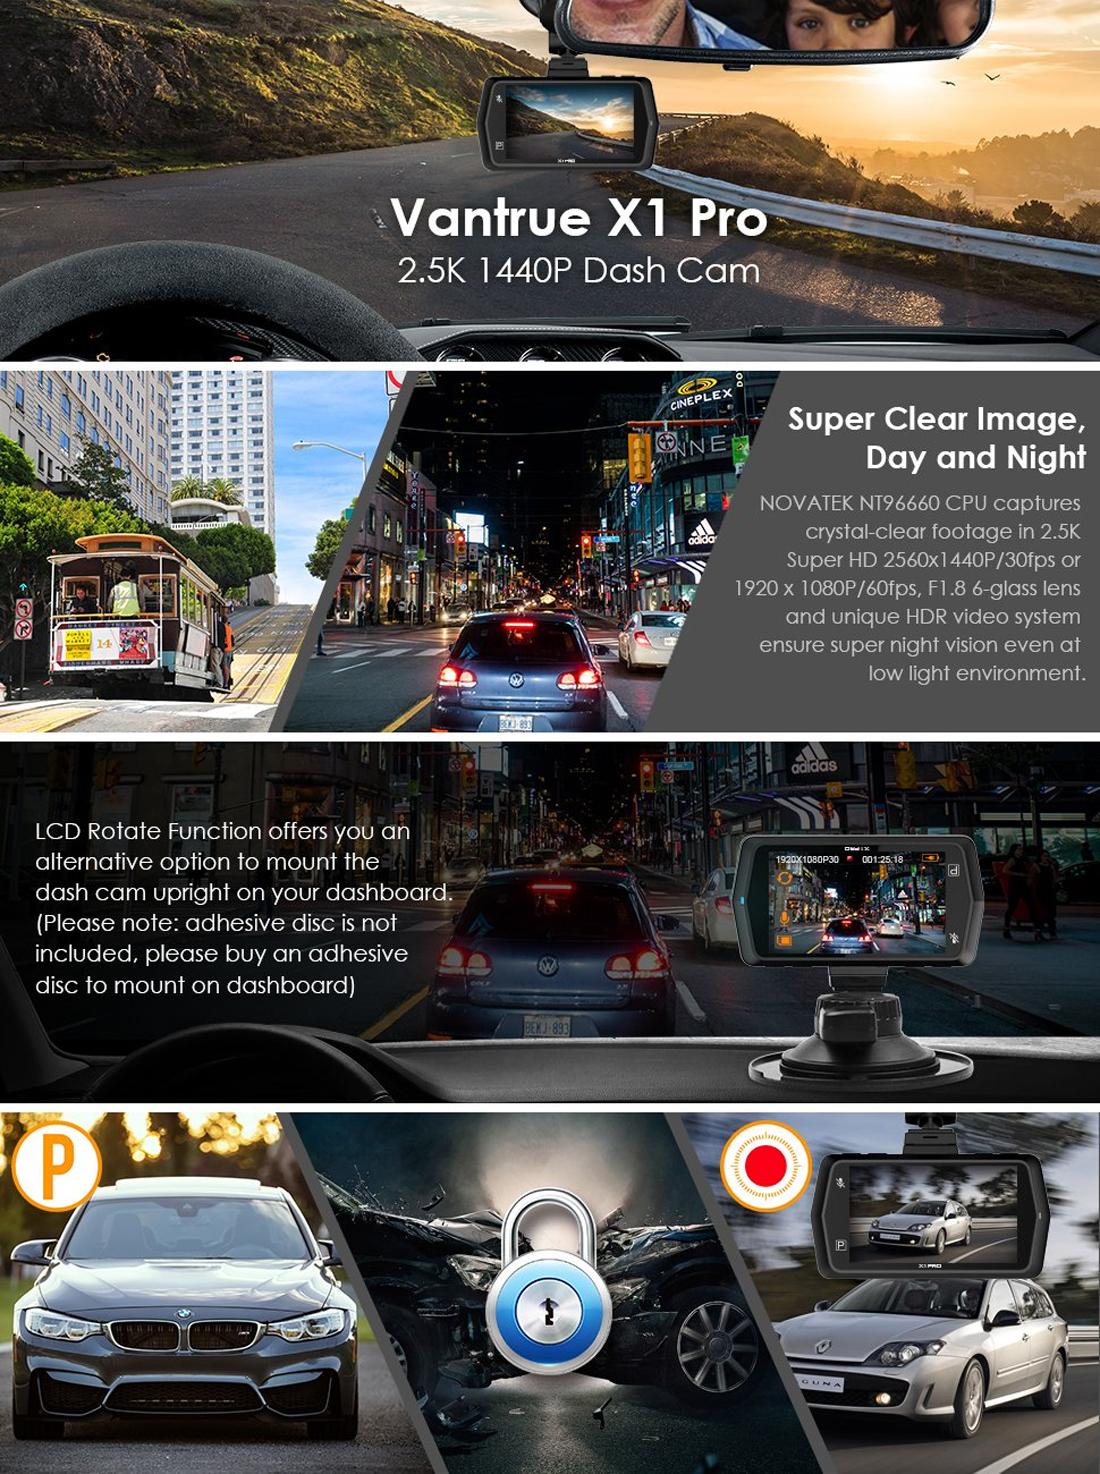 Vantrue X1 Pro 2 5K Dash Cam Super HD 1440P30 1080P60 Car Video